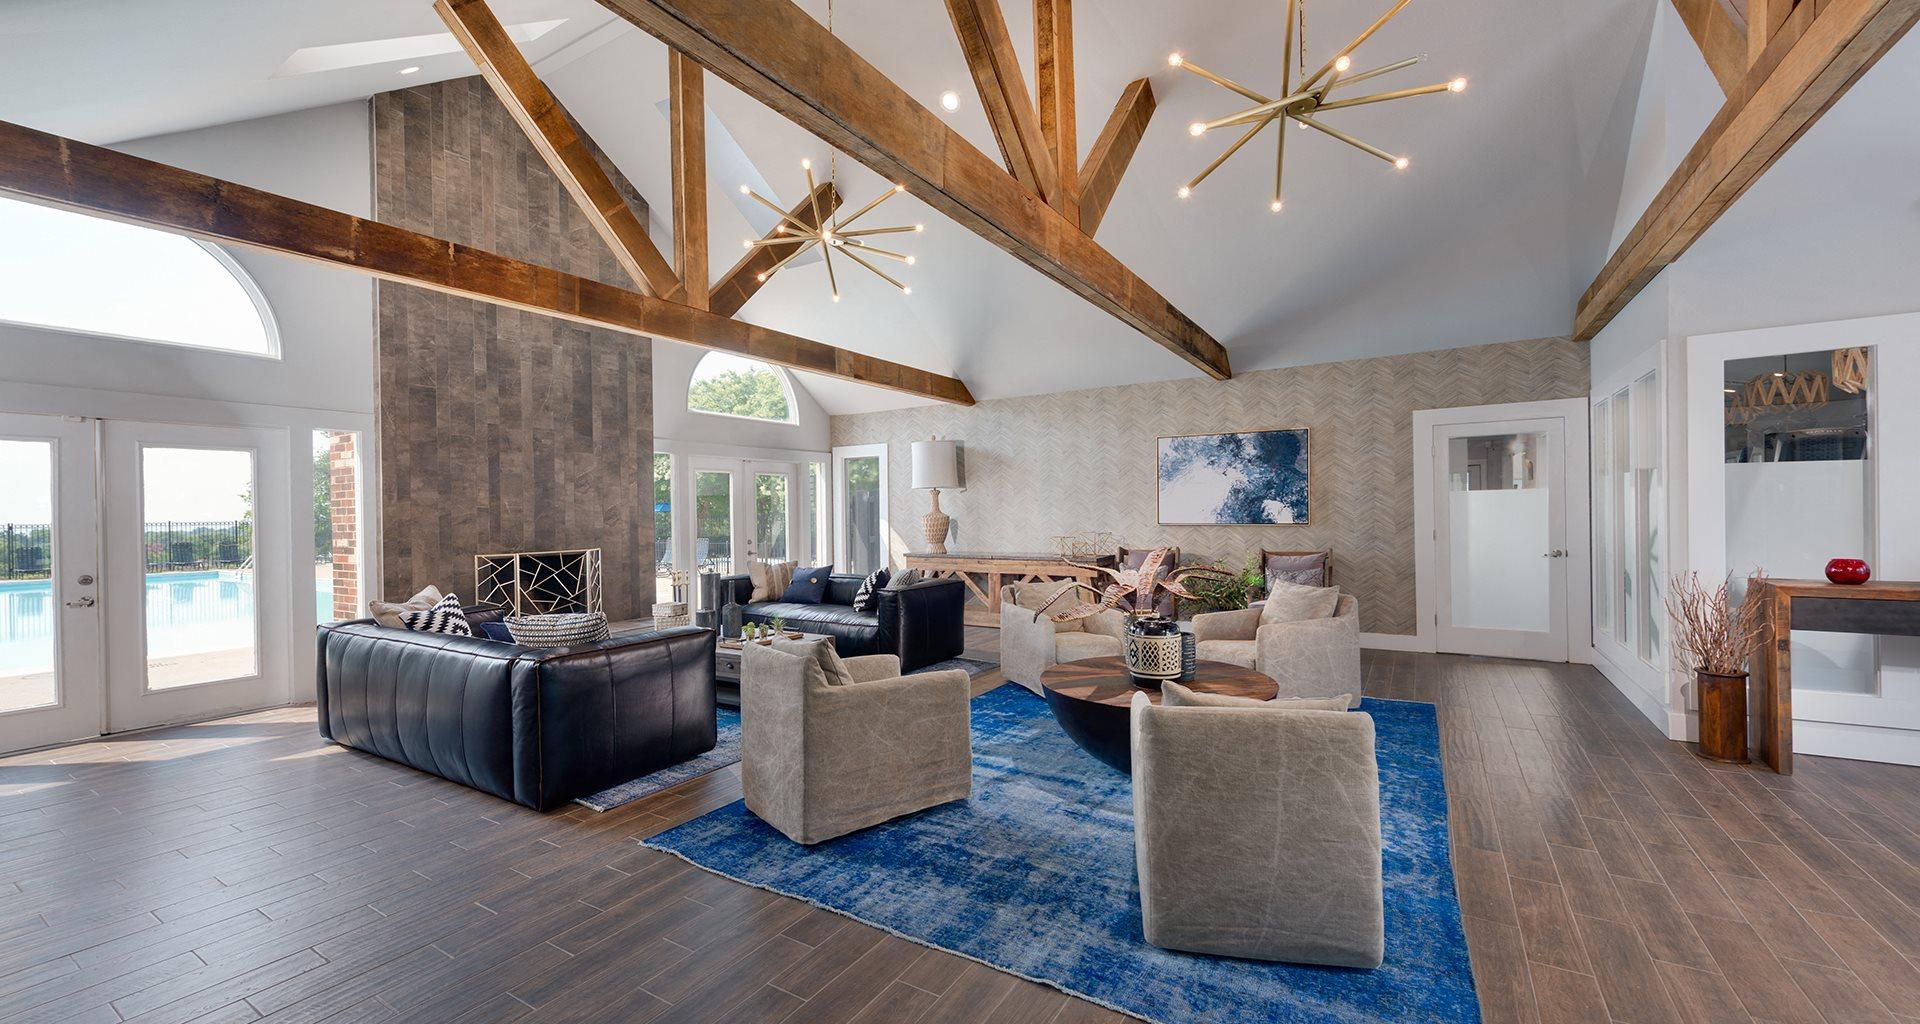 Potomac vista apartments apartments in woodbridge va - 2 bedroom apartments in woodbridge va ...